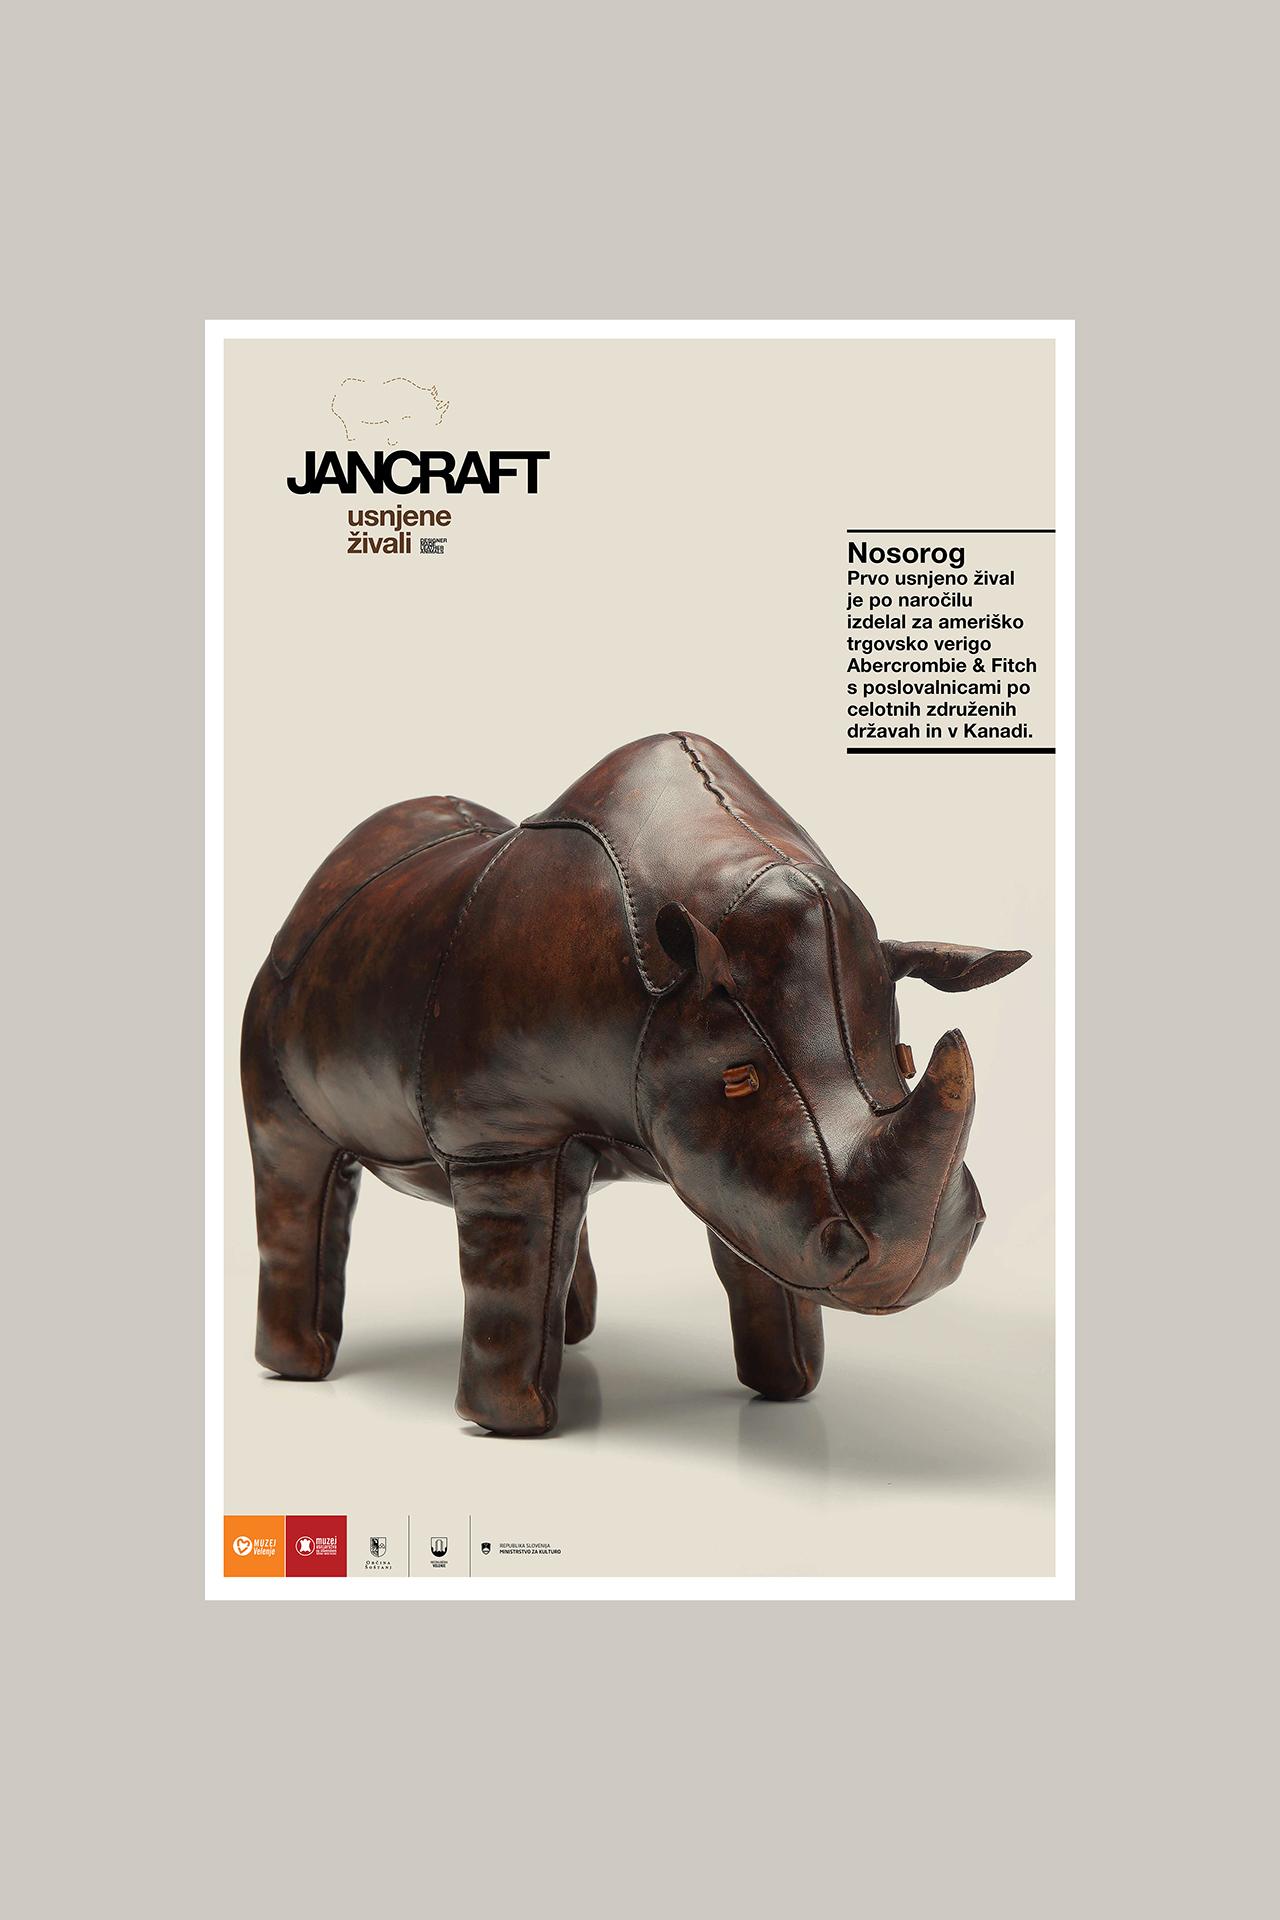 jancraft_plakati_razstava_856x1250_2_screen-3